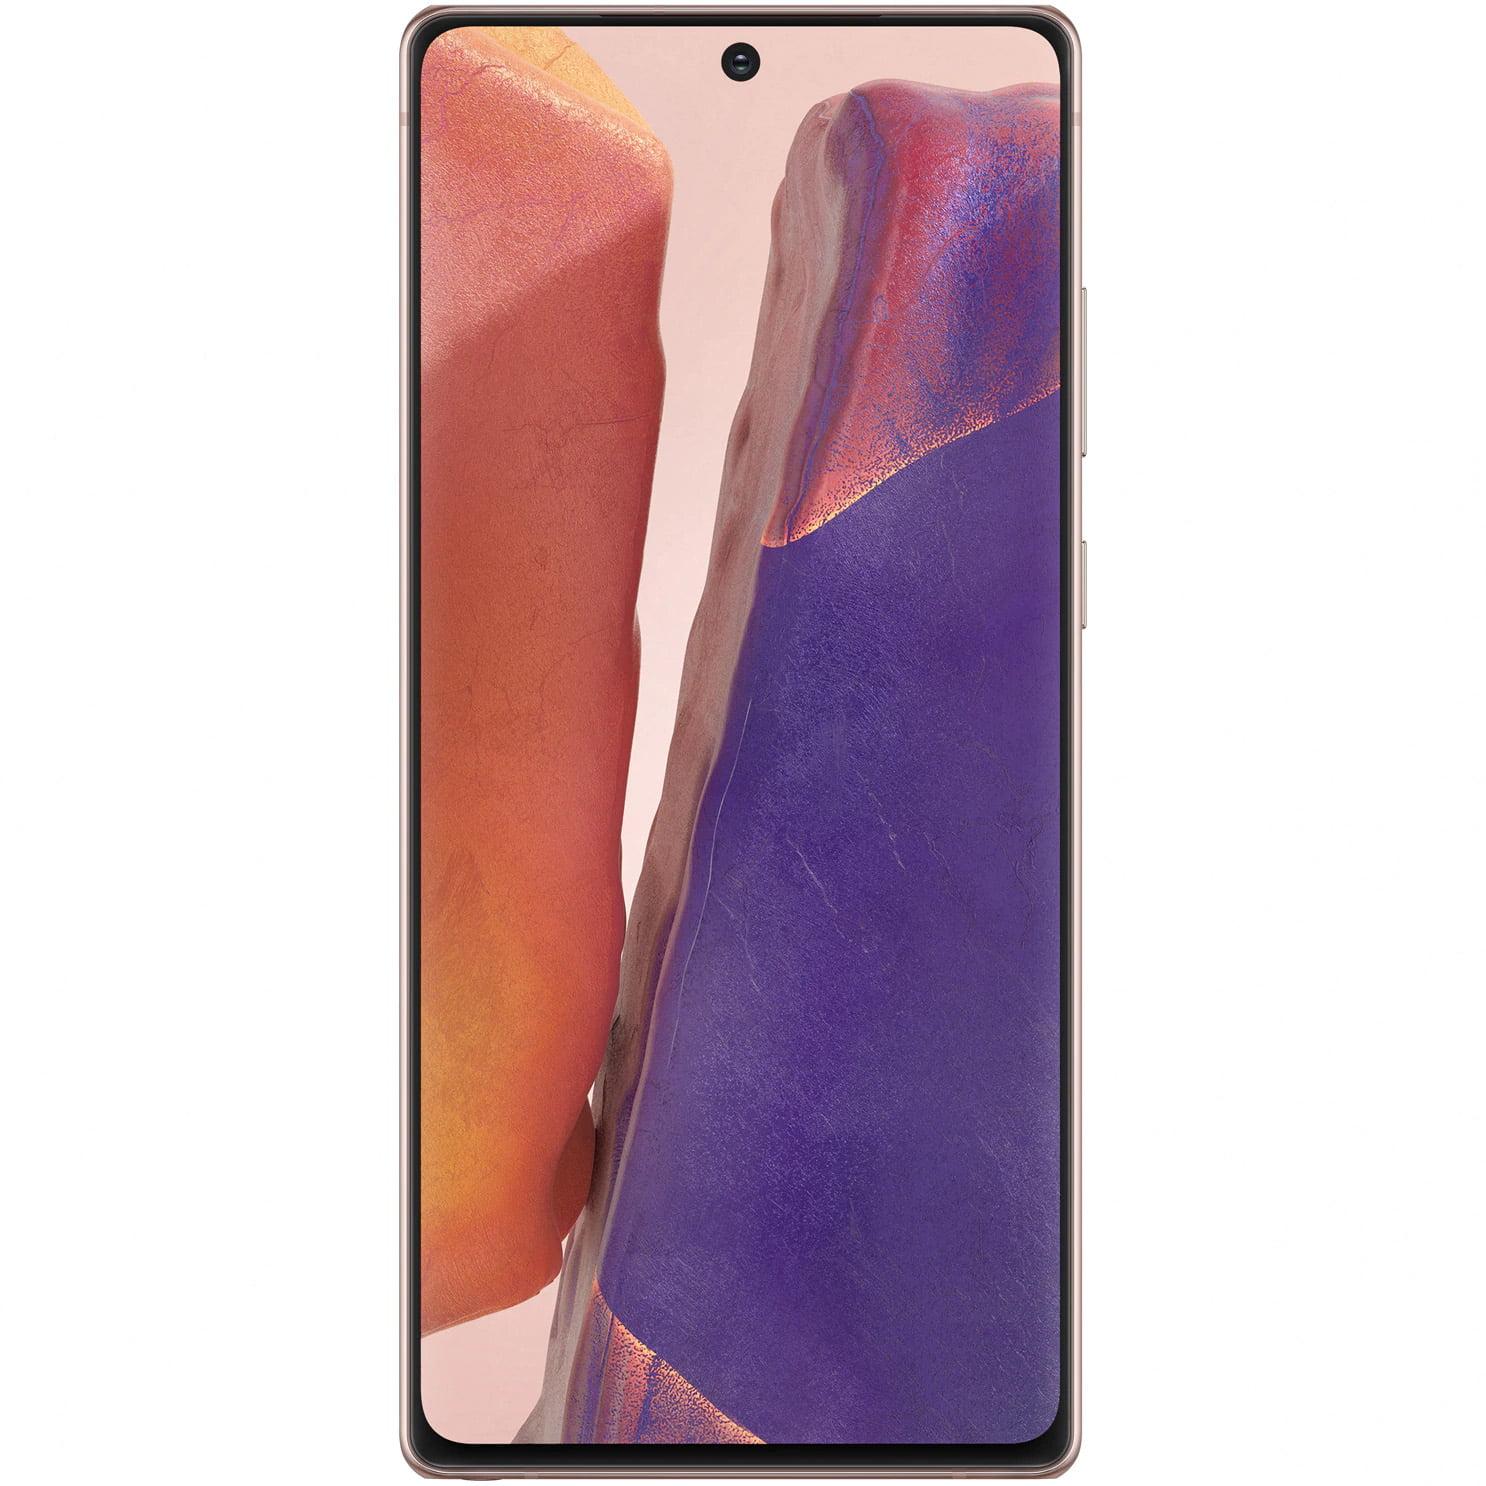 Telefon mobil Samsung Galaxy Note 20, Dual SIM, 256GB, 8GB RAM, 4G, Mystic Bronze